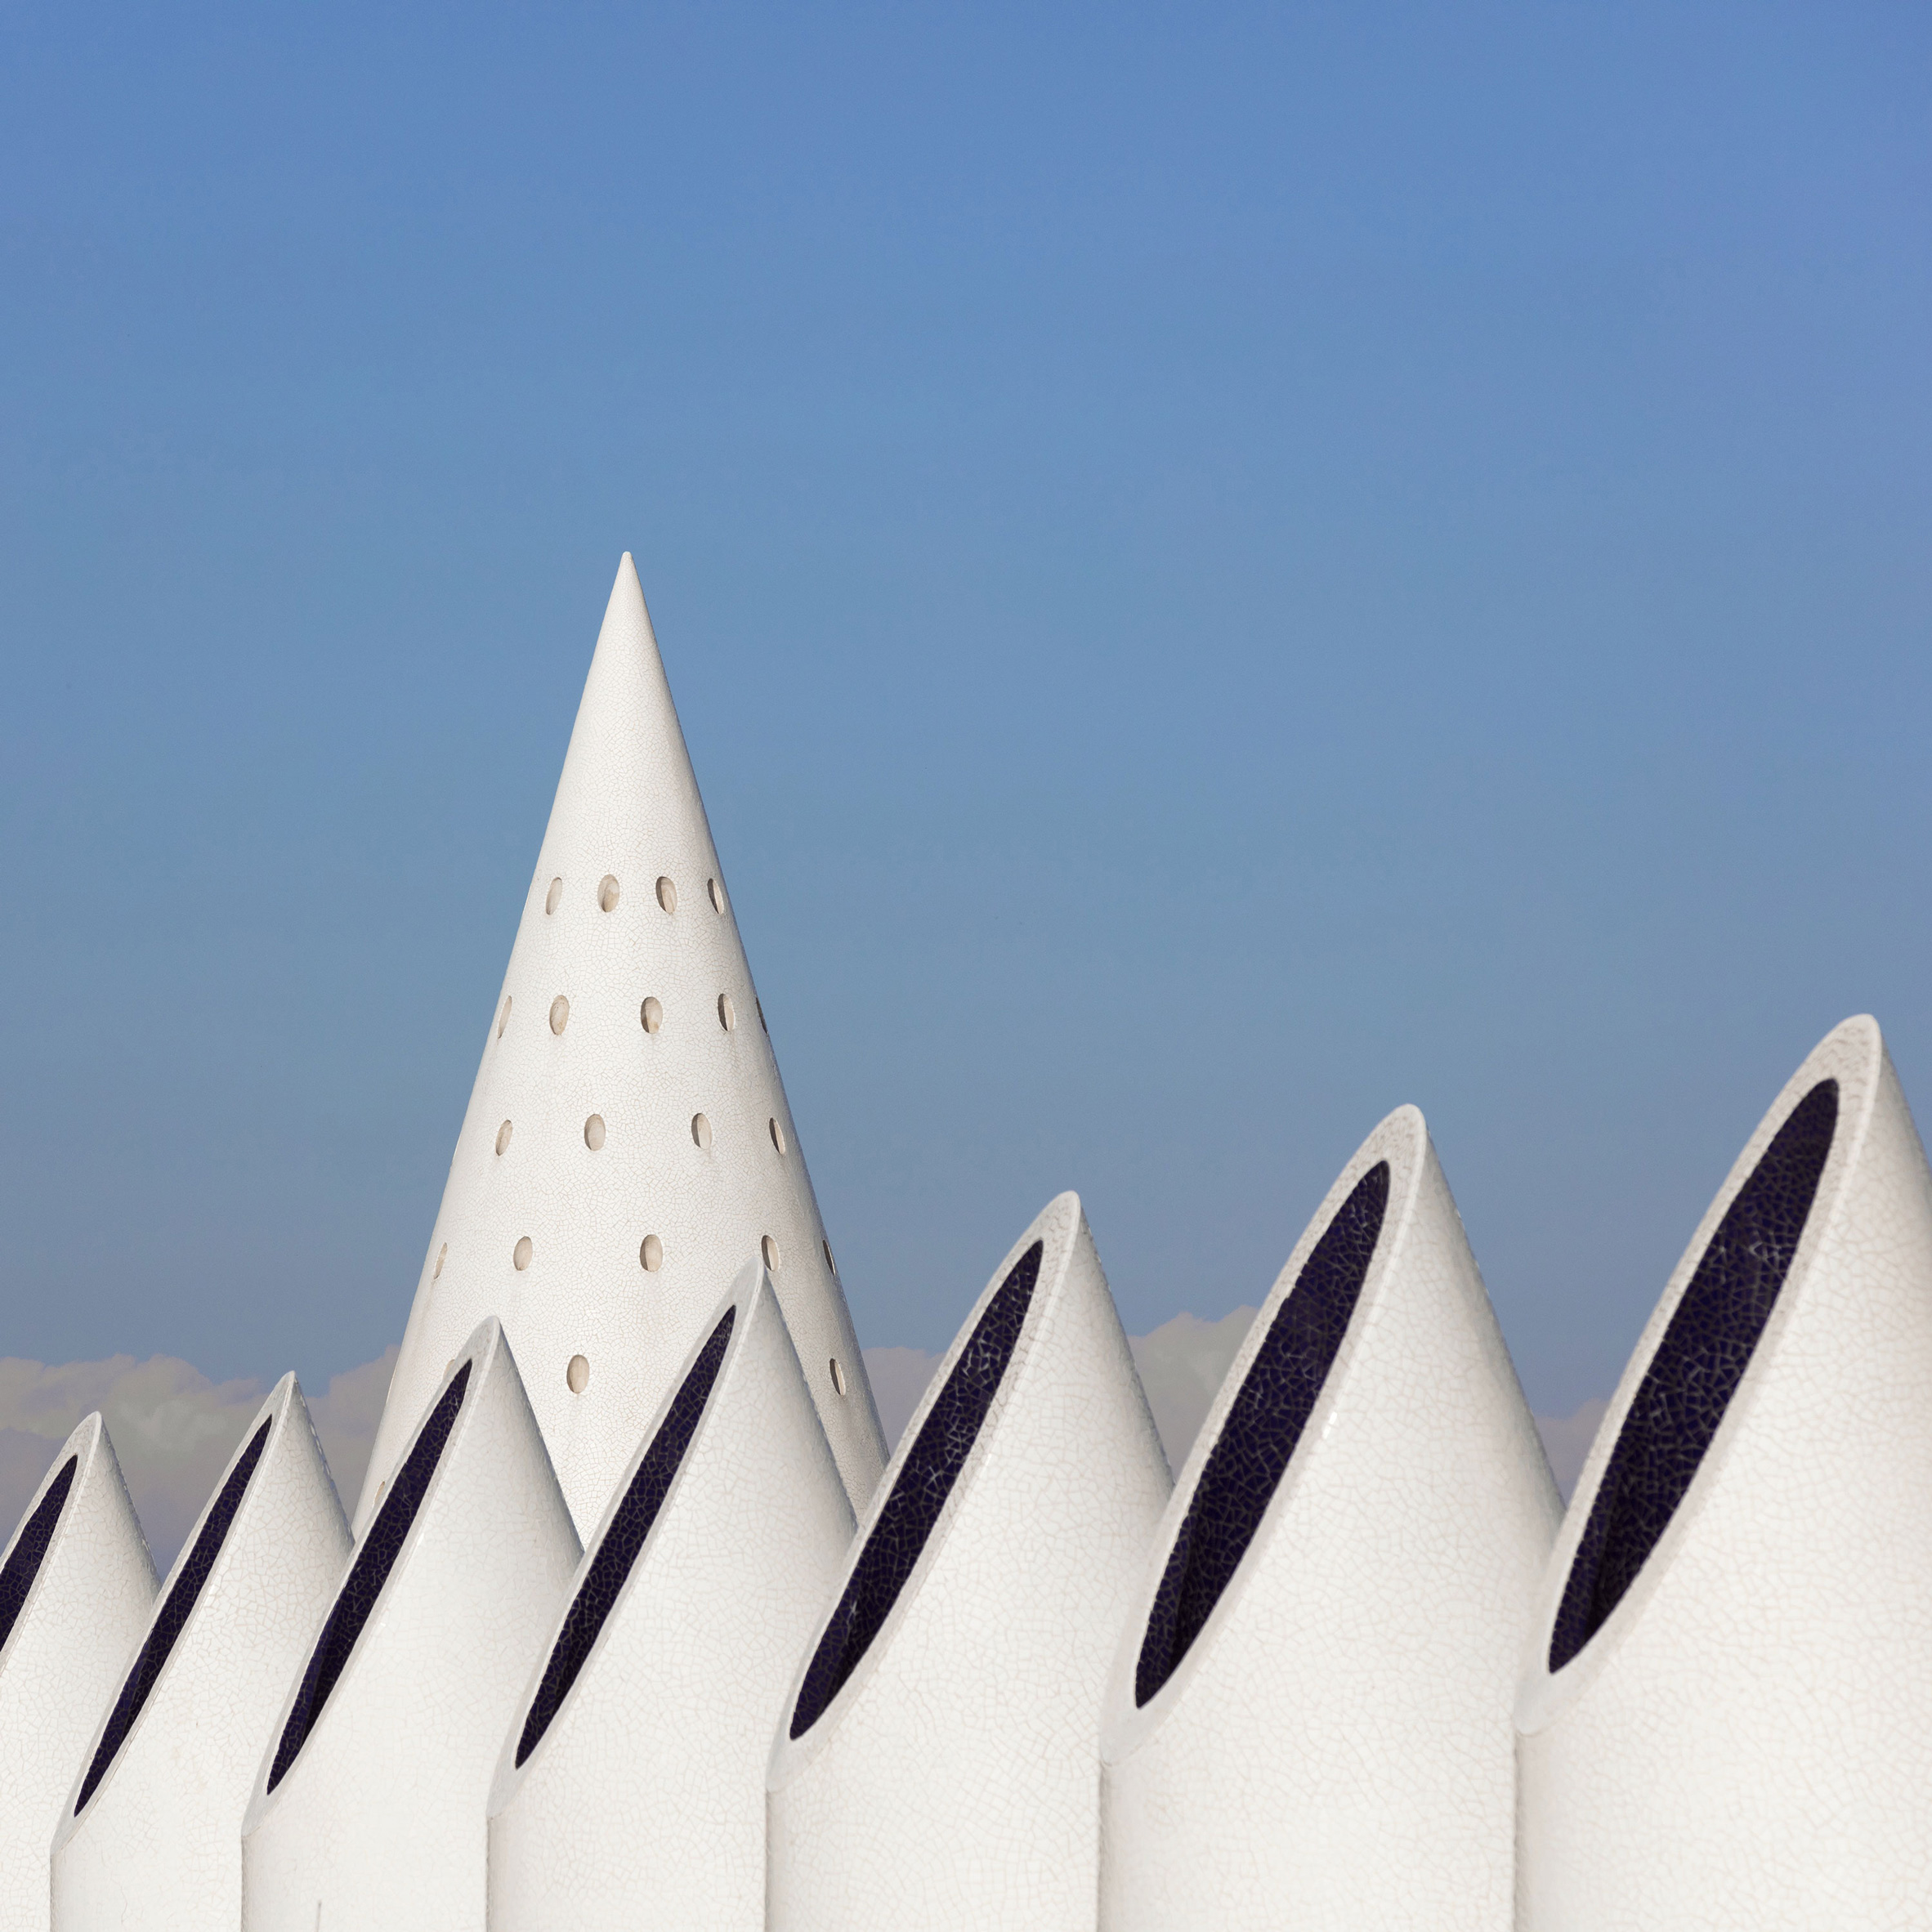 Photographer Sebastian Weiss Presents Calatravas Valencian Architecture As White Sculptures